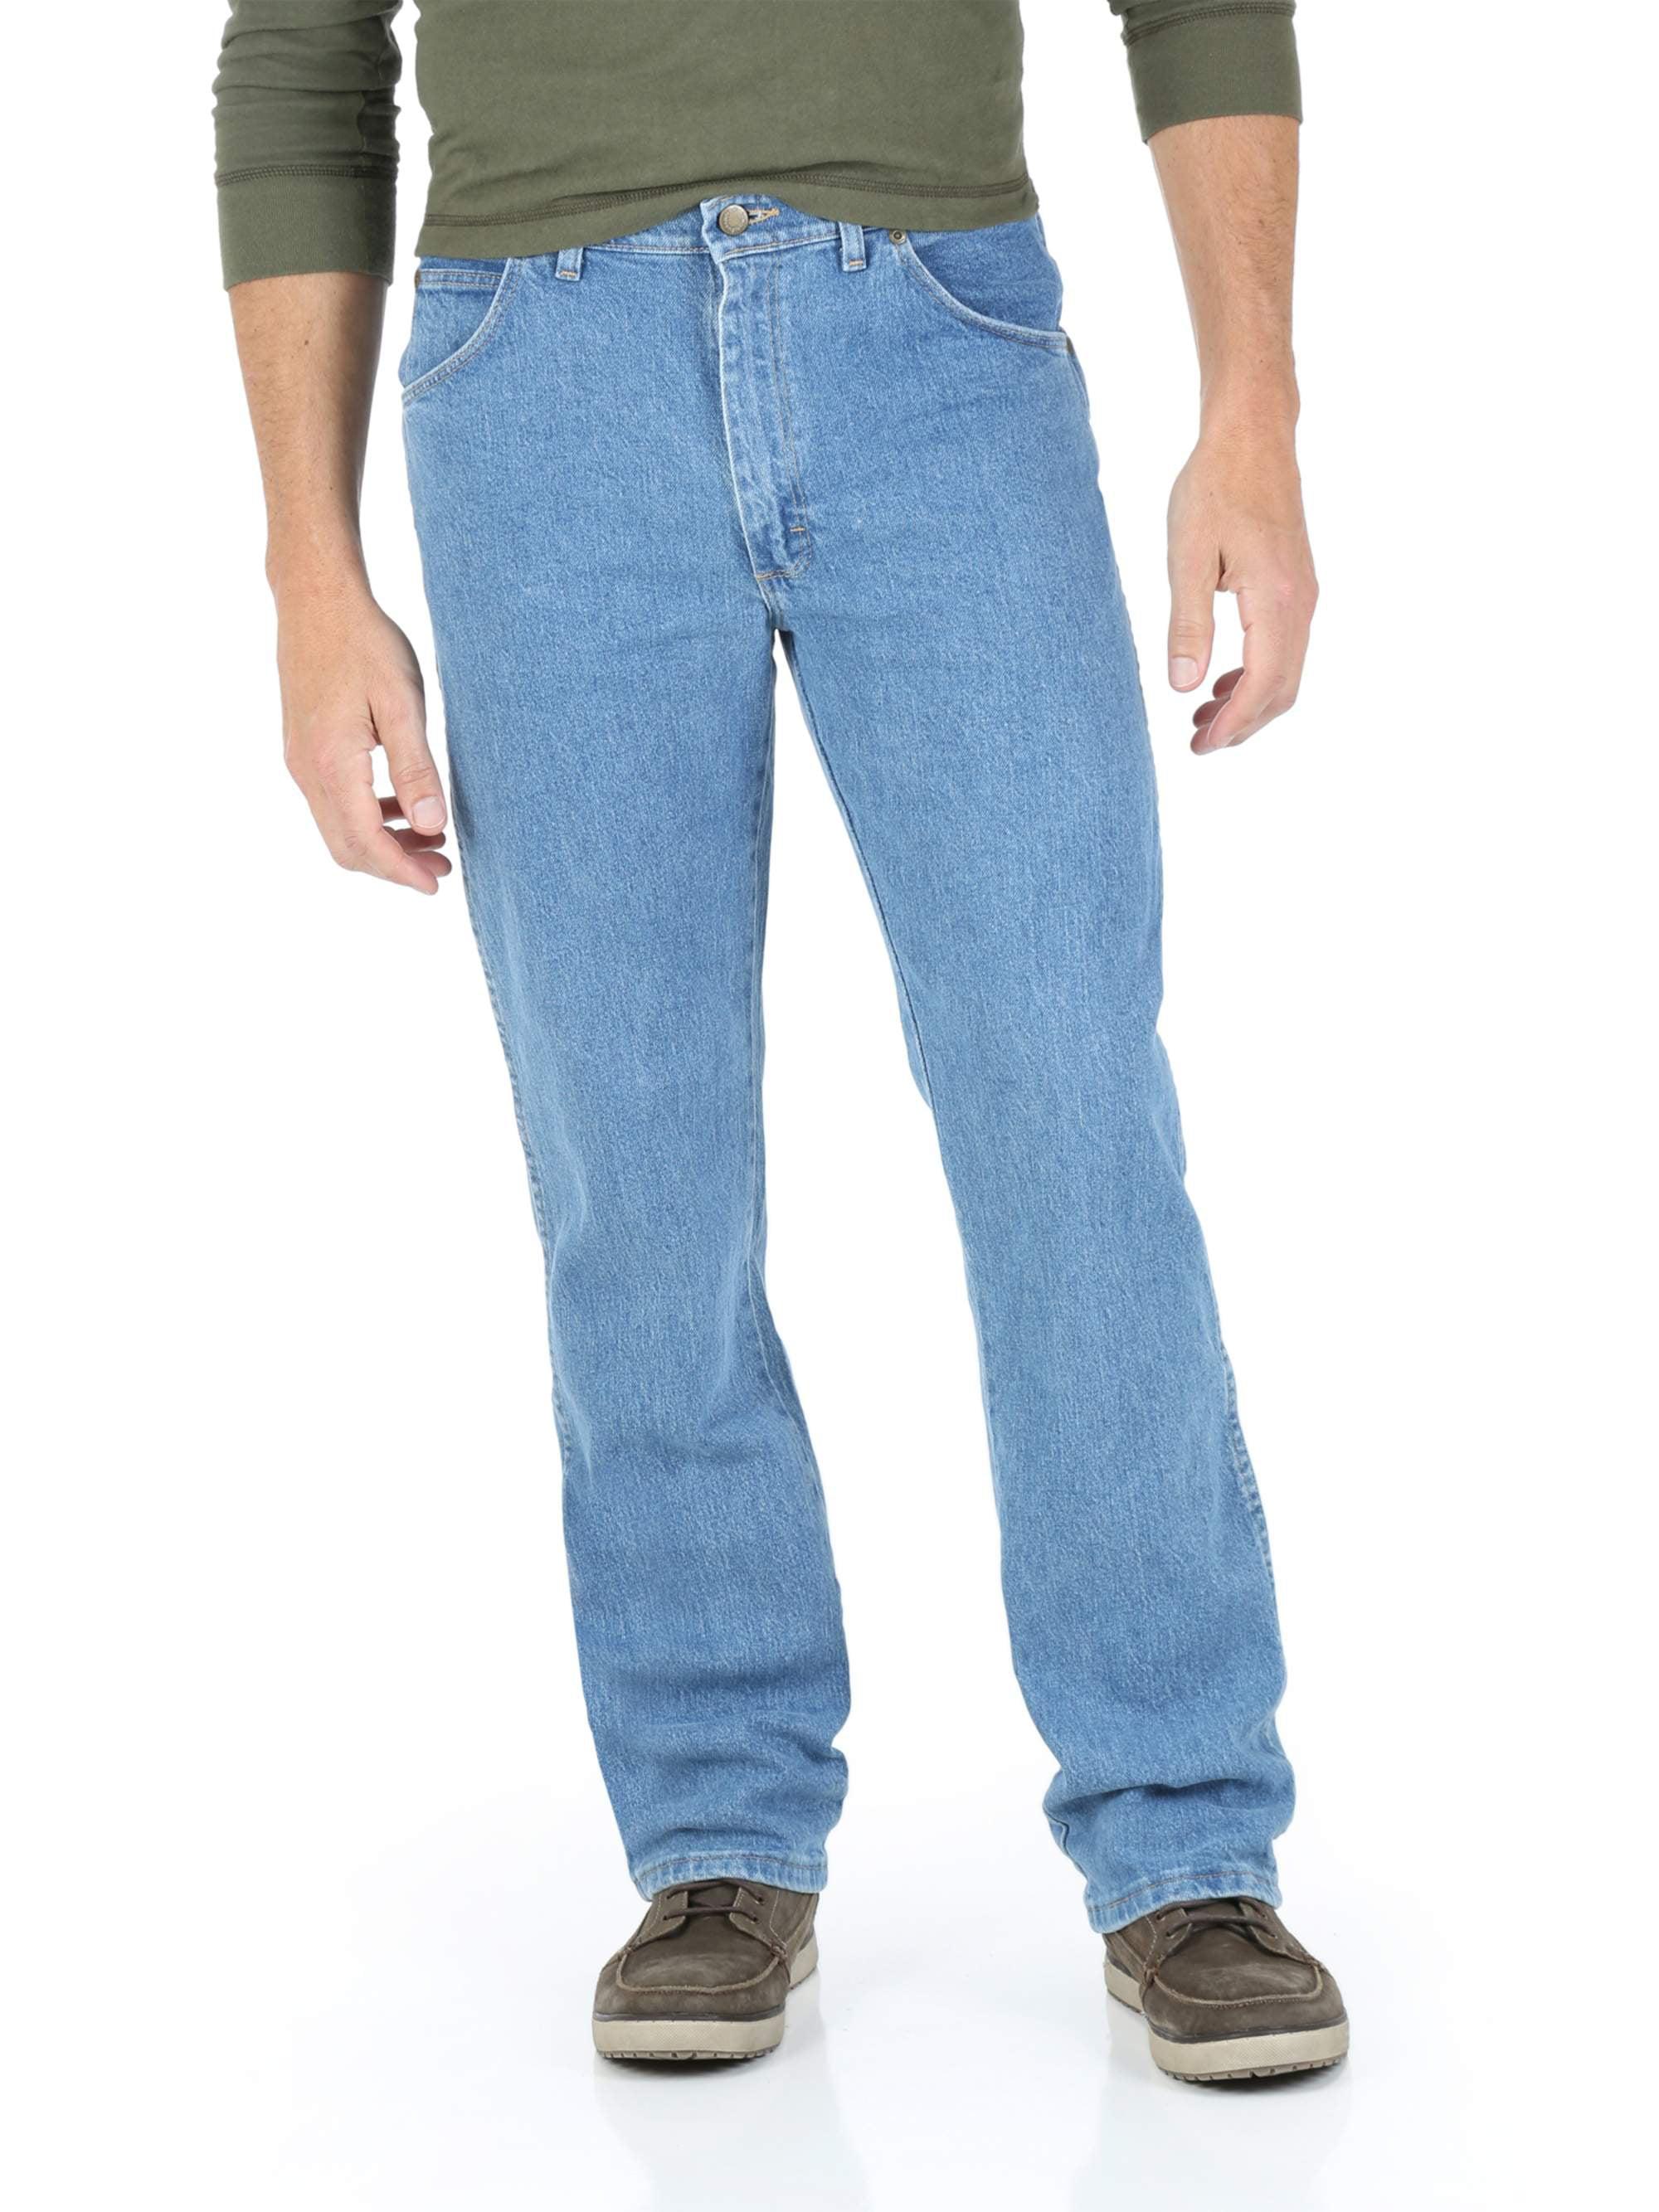 a8a5b58edb6 Wrangler - Big Men's Regular Fit Jeans with Comfort Flex Waistband -  Walmart.com